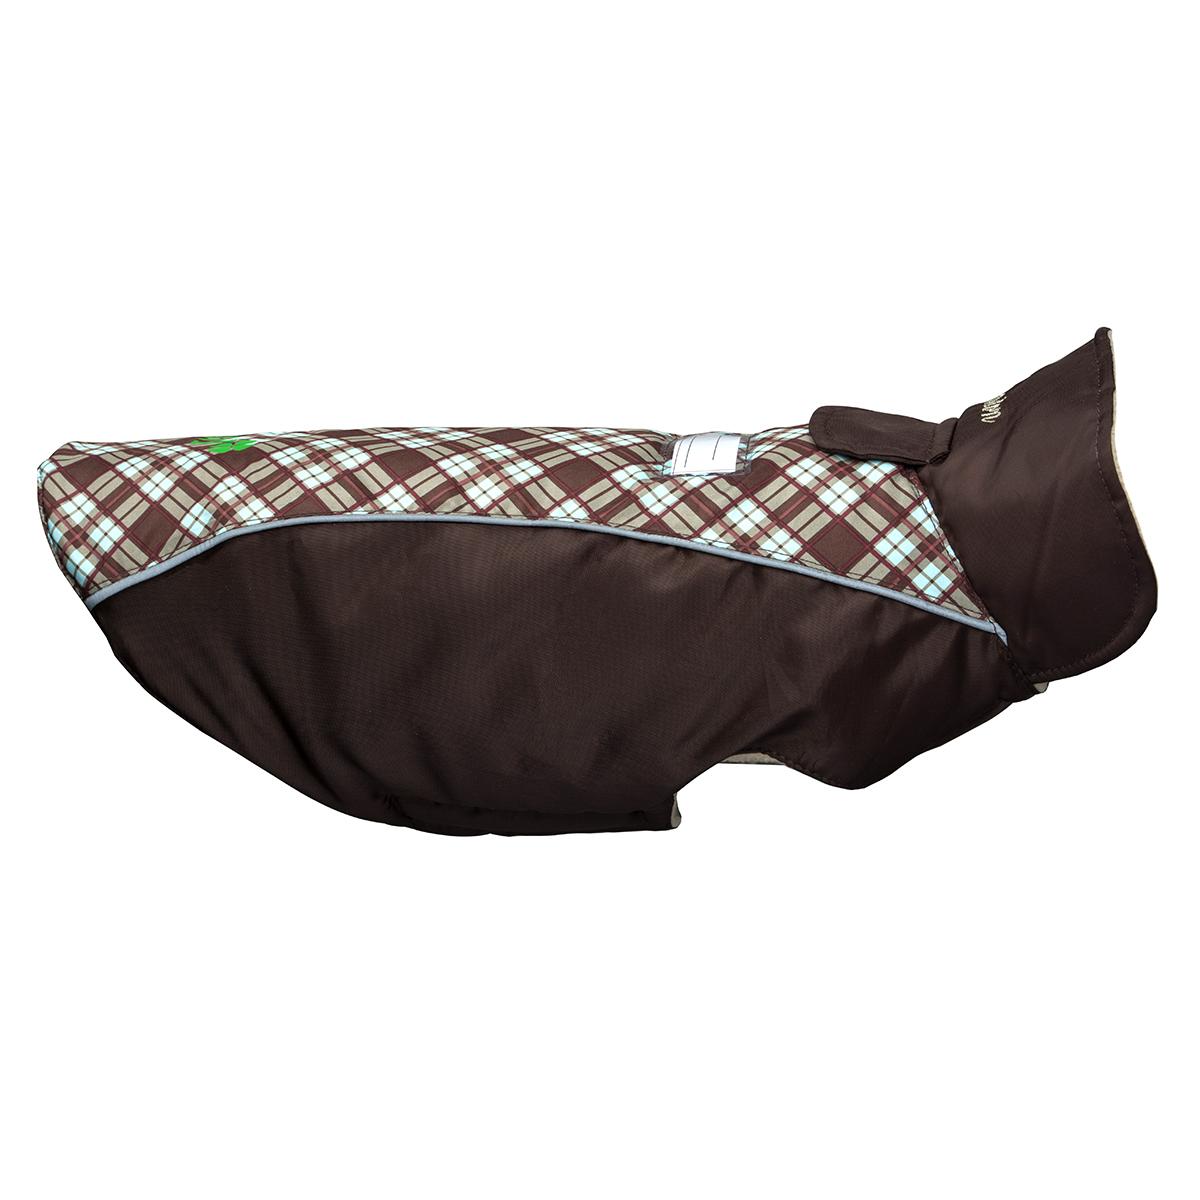 Попона для собак Dogmoda Бостон, унисекс. Размер XXXXL